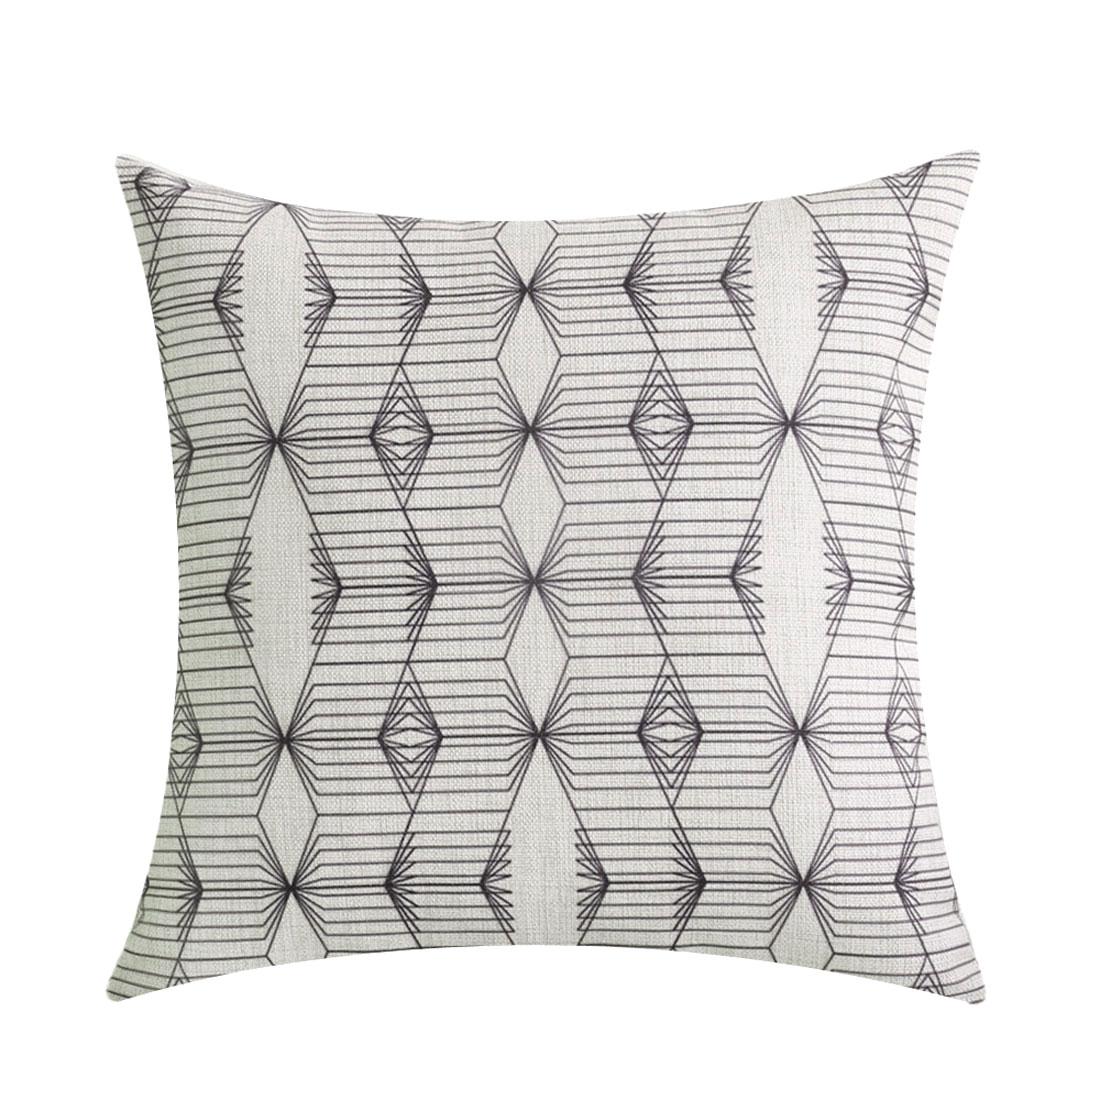 Sofa Cotton Linen Geometric Pattern Square Design Waist Back Cushion Cover Pillow Case